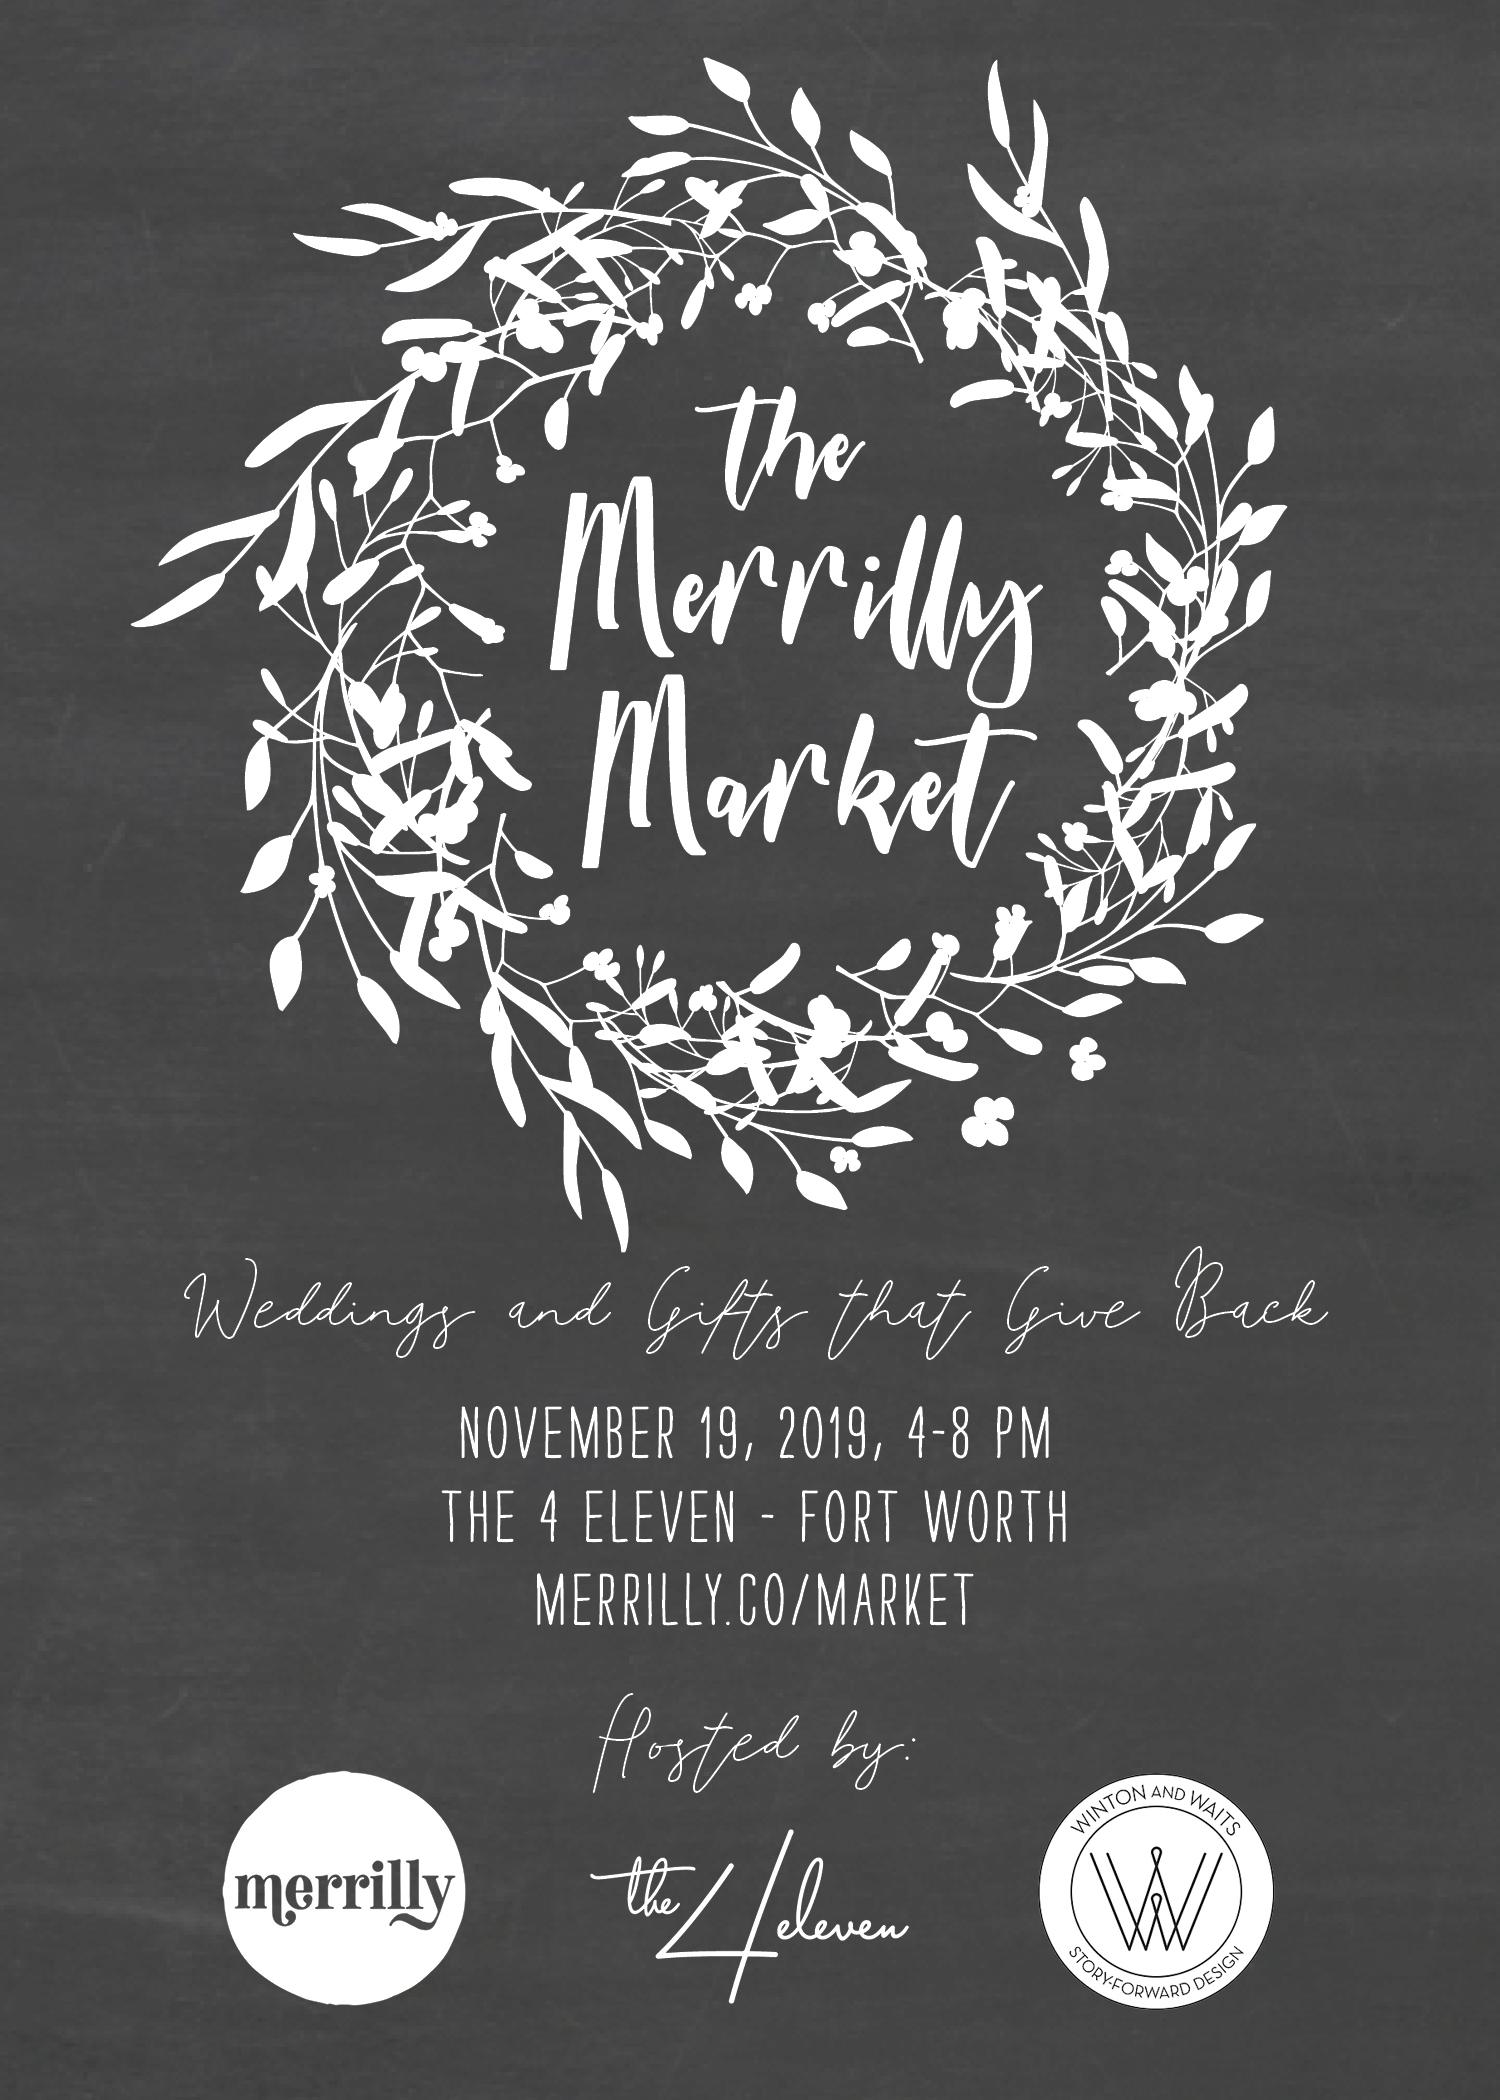 TheMerrilyMarket.png